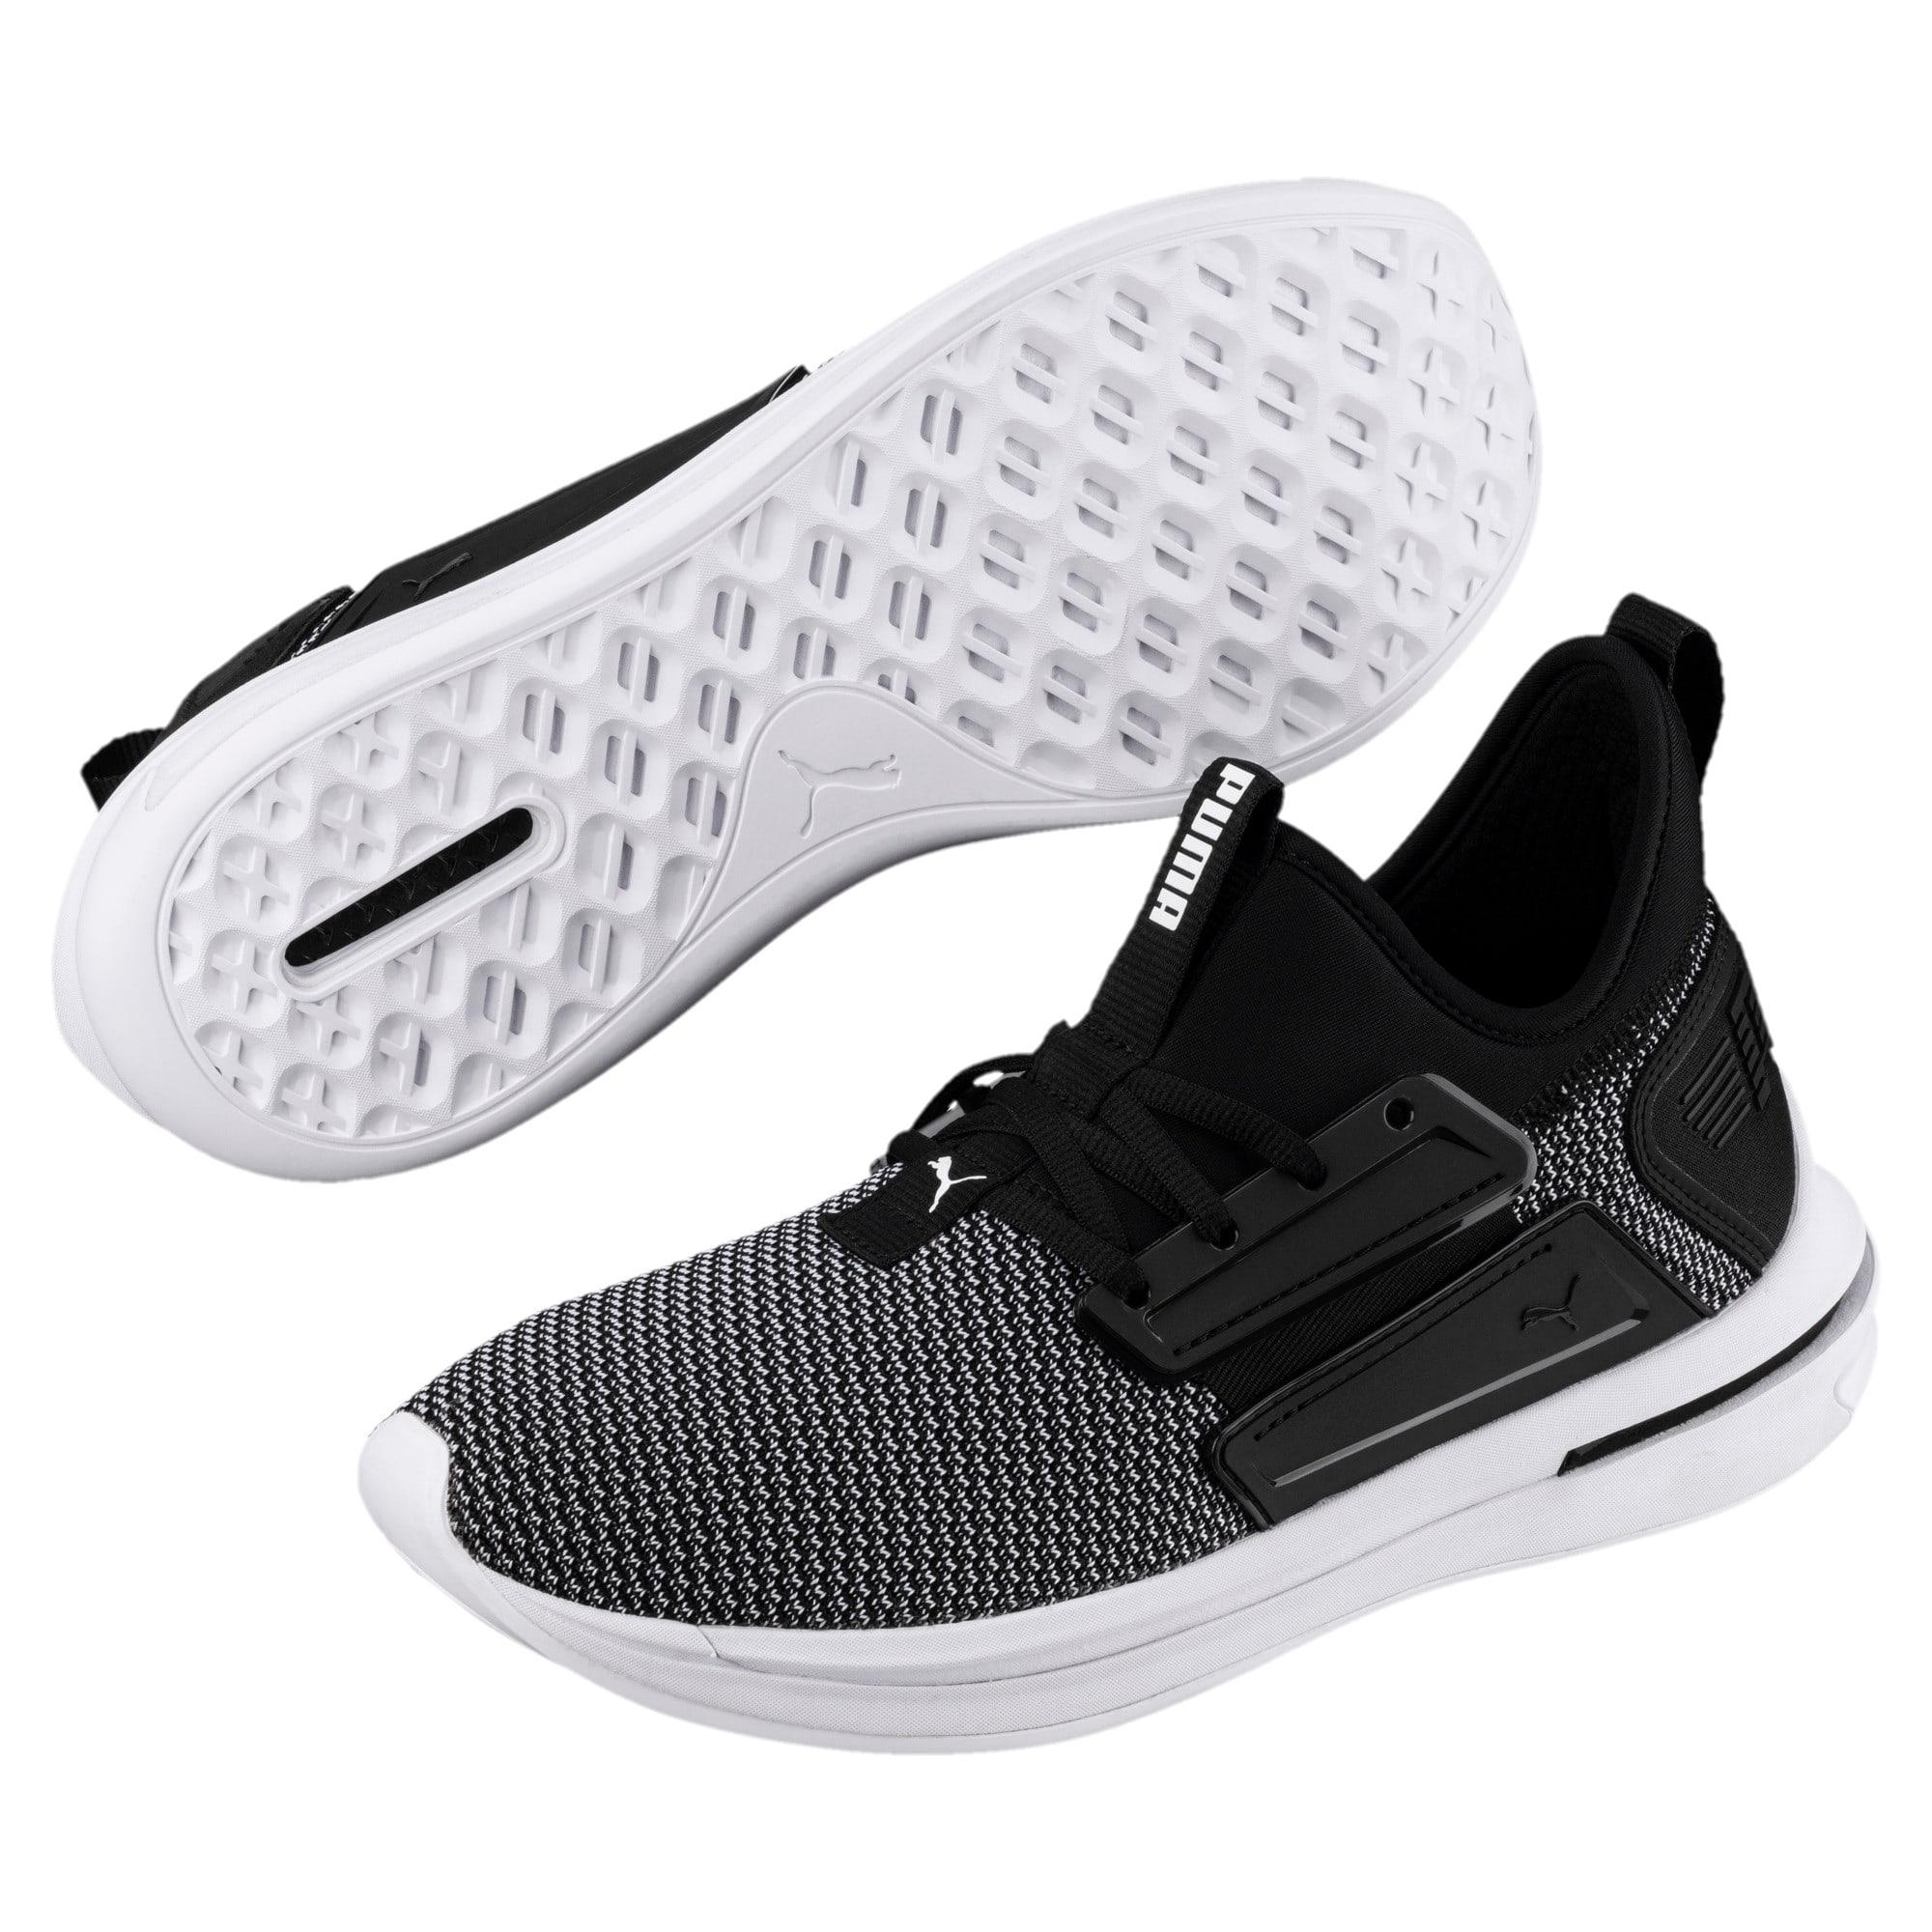 Thumbnail 2 of IGNITE Limitless SR New School Sneakers, Puma Black-Puma White, medium